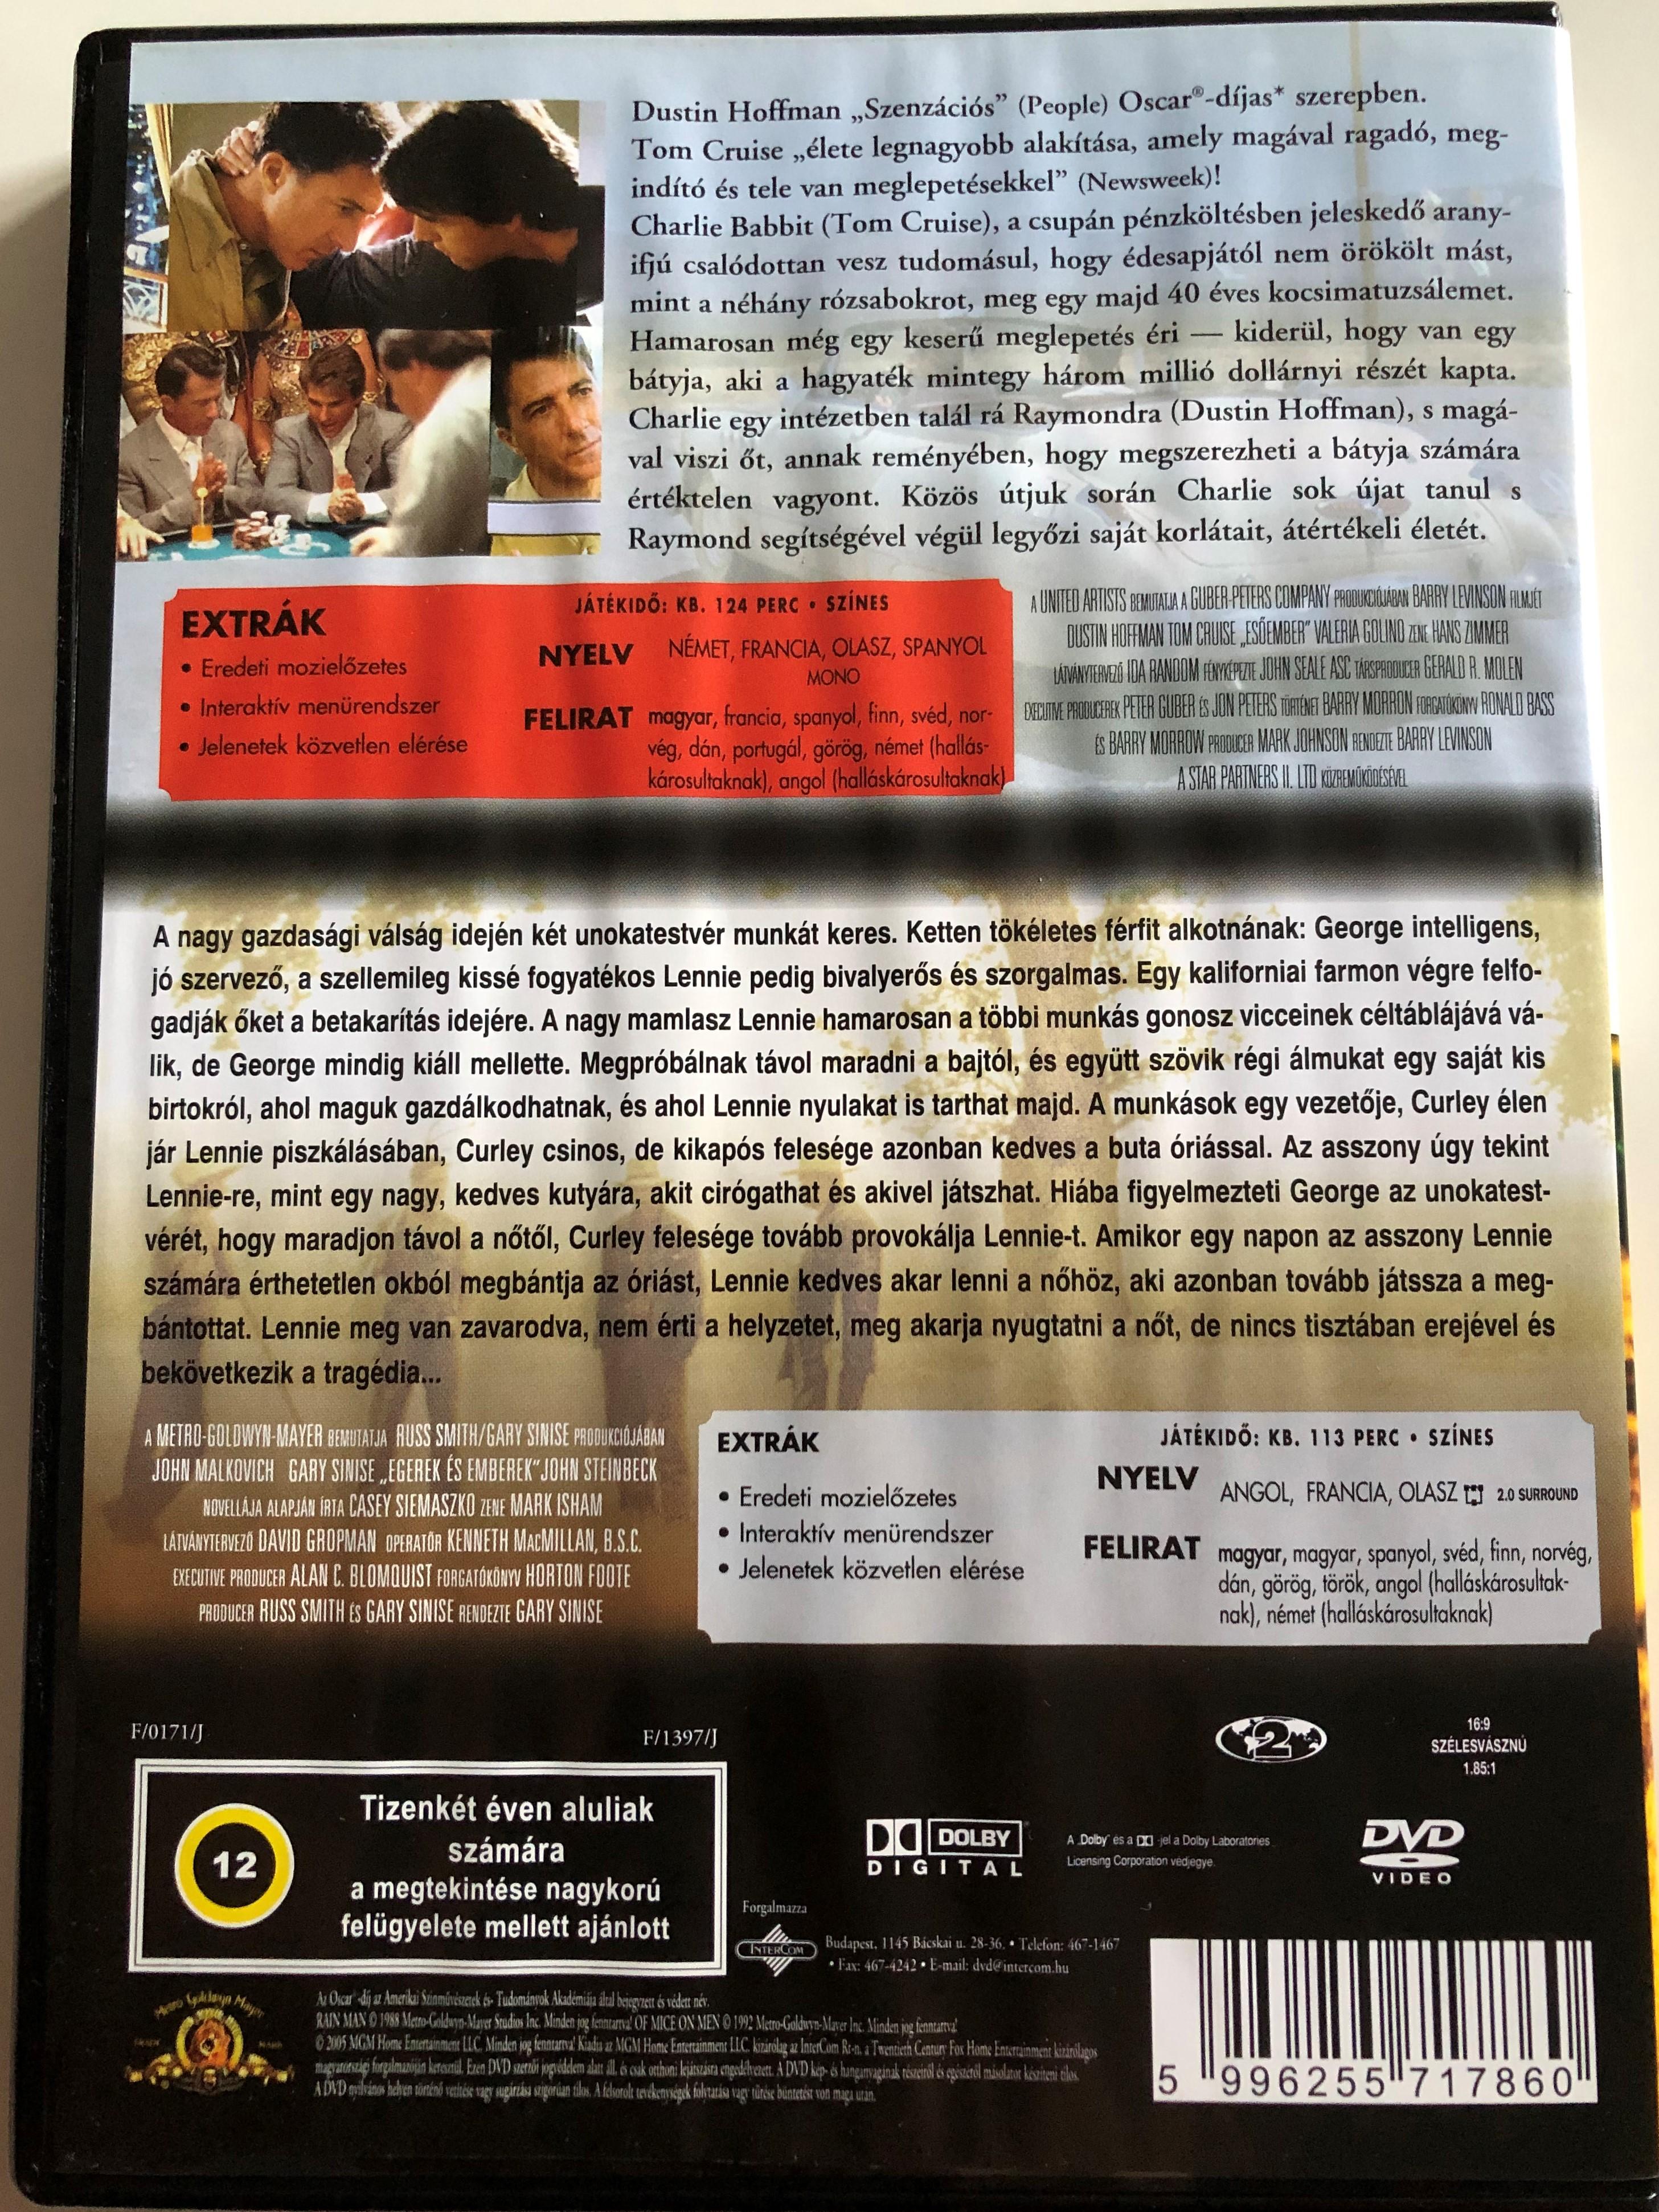 rain-man-dvd-1988-es-ember-3.jpg